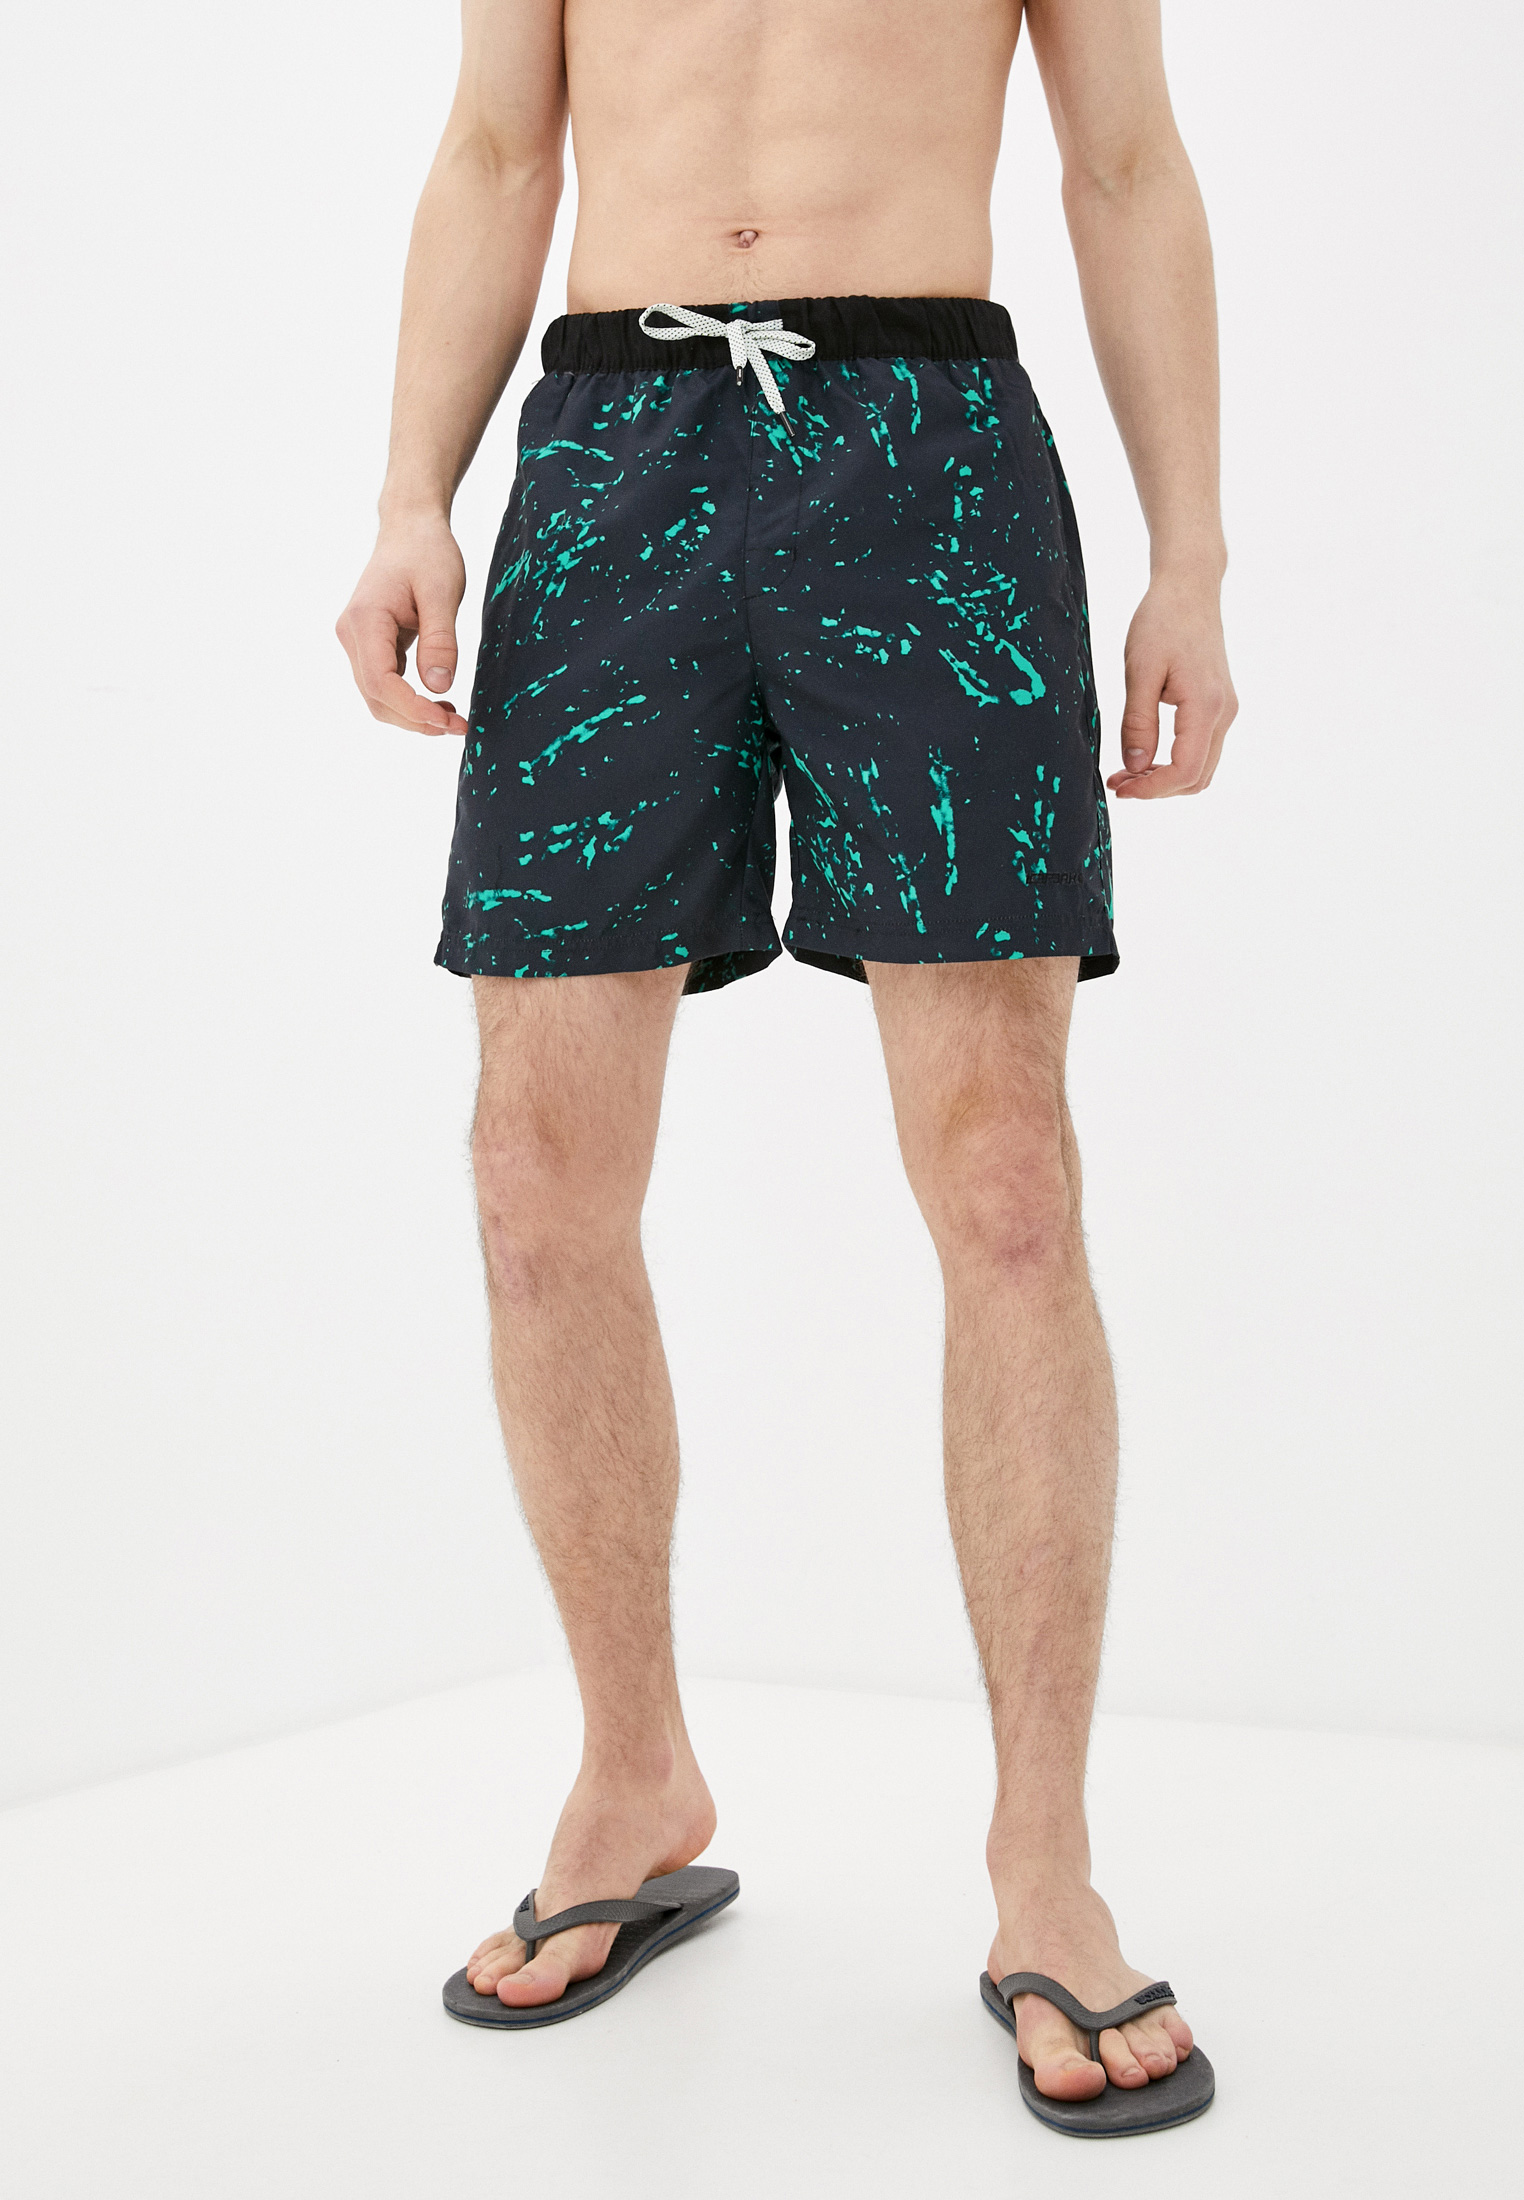 Мужские шорты для плавания Icepeak Шорты для плавания Icepeak